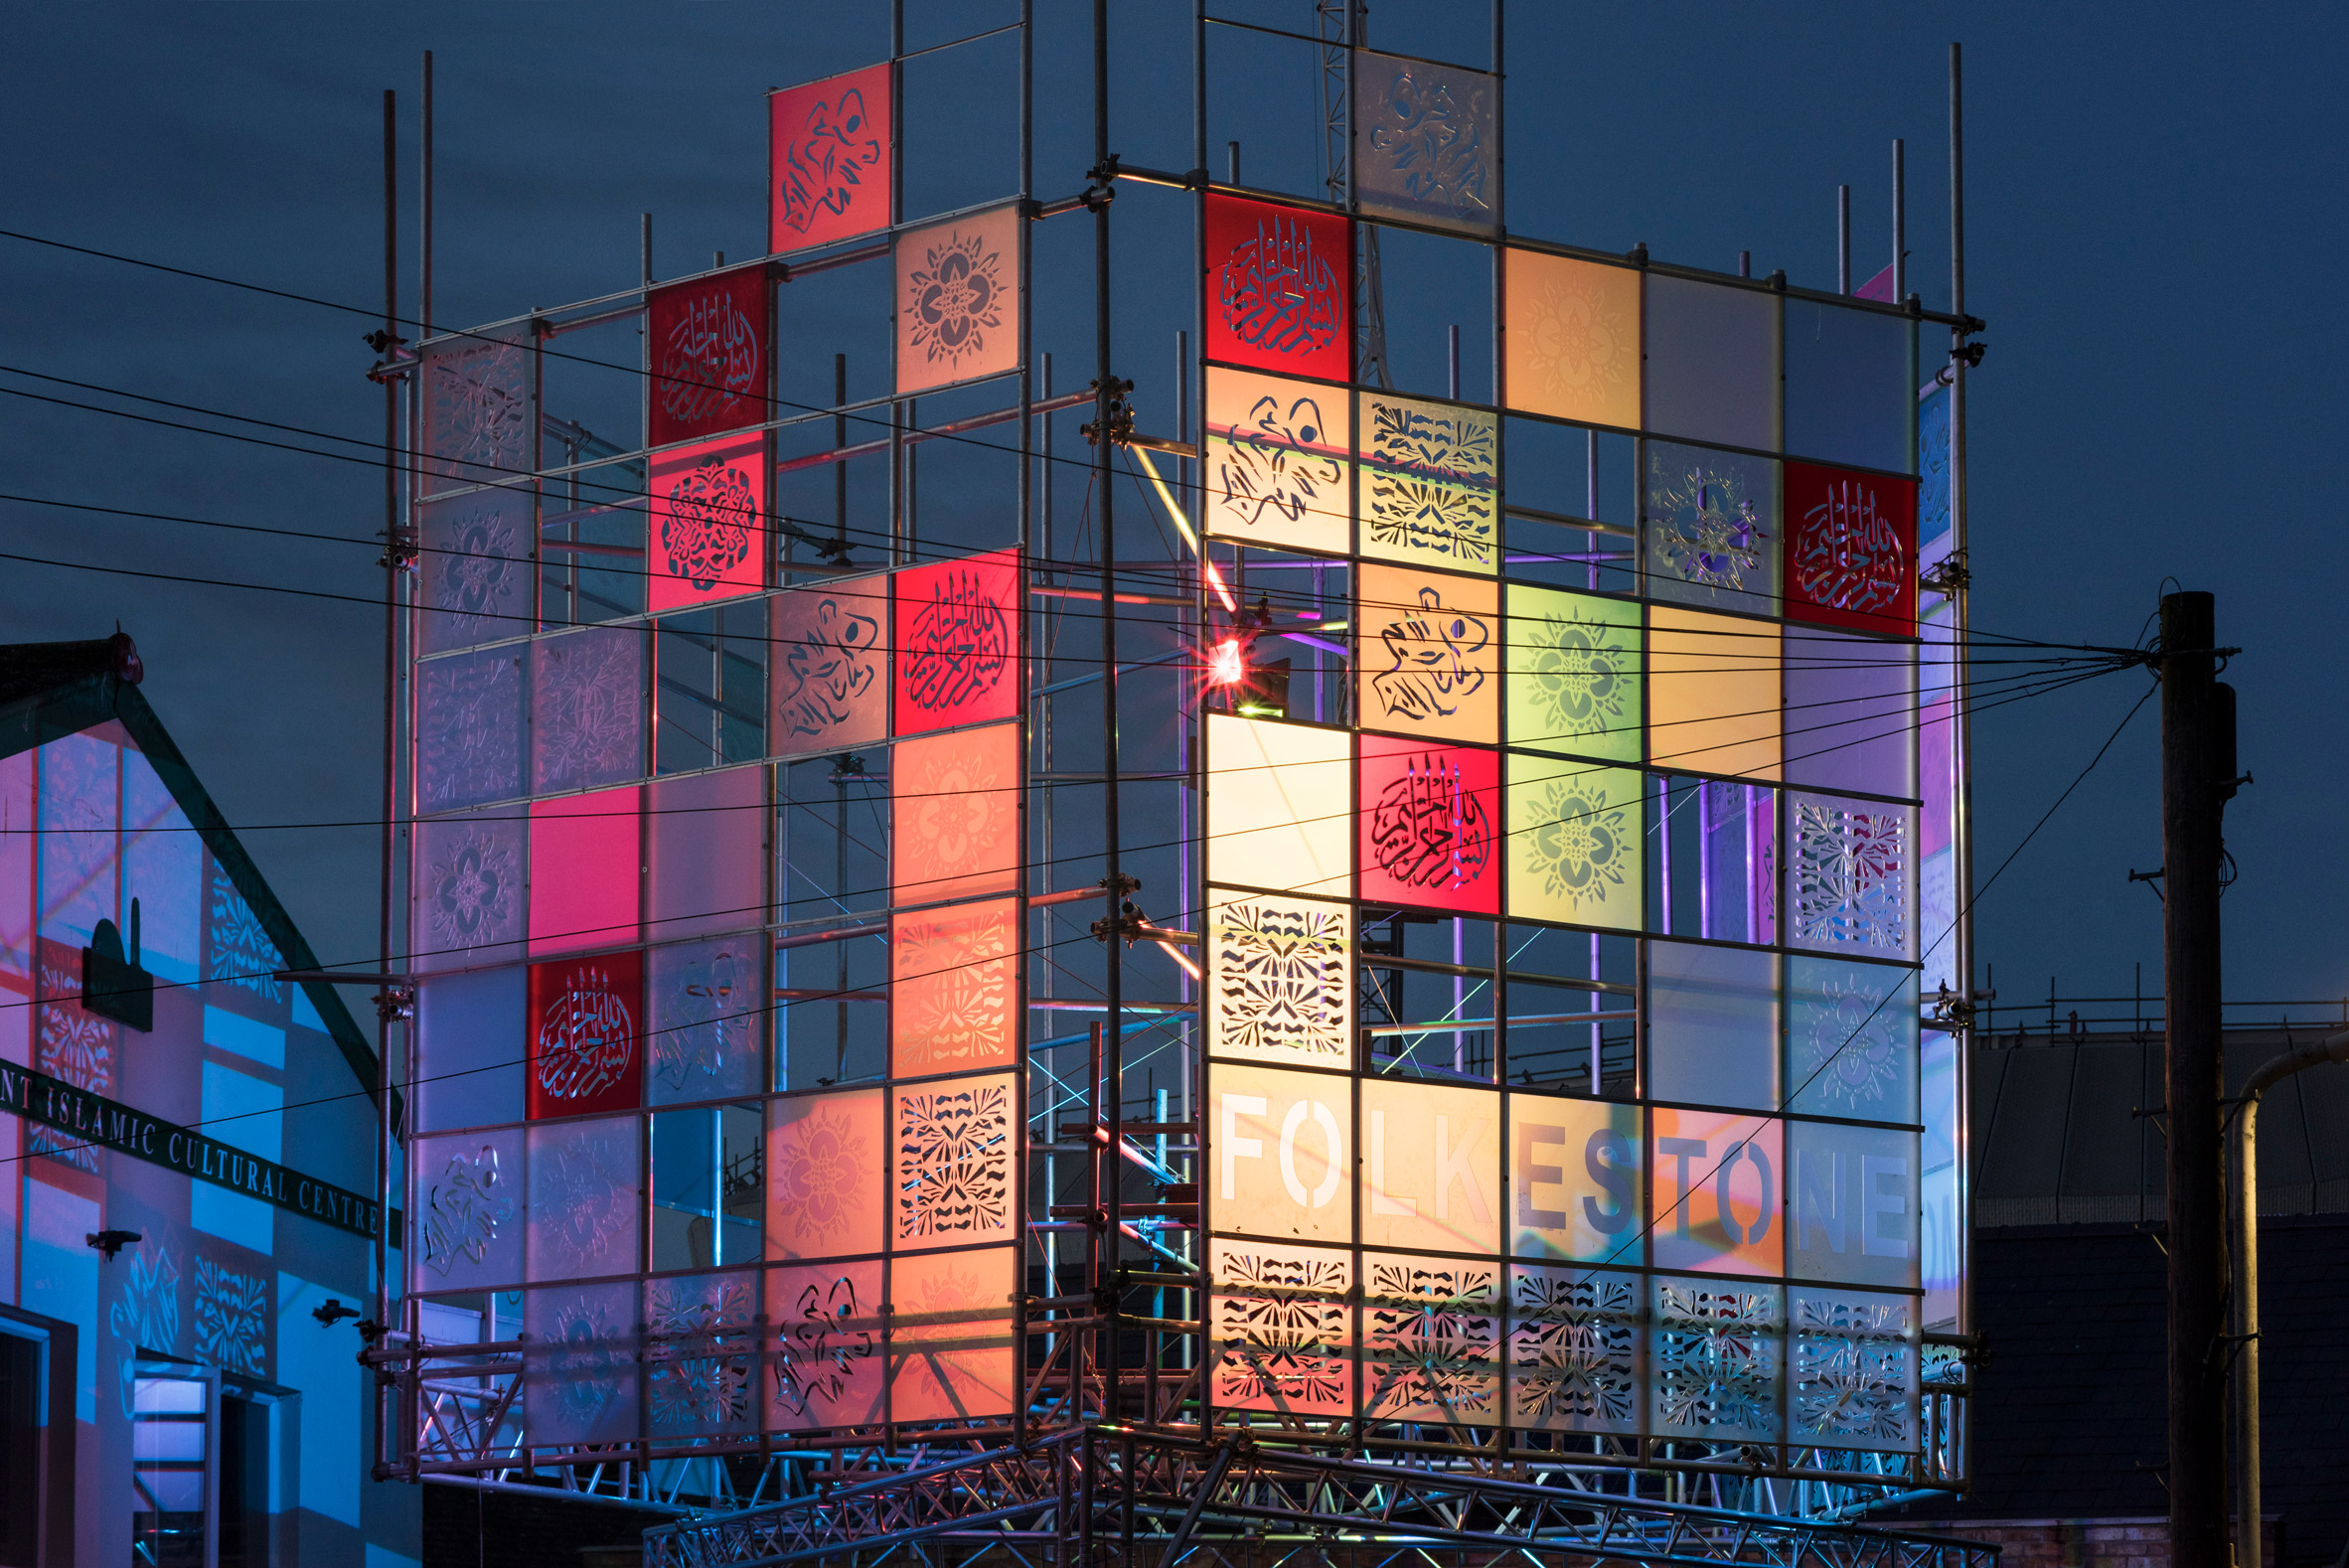 Lantern with colourful acrylic panels by HoyCheong Wong and Simon Davenport